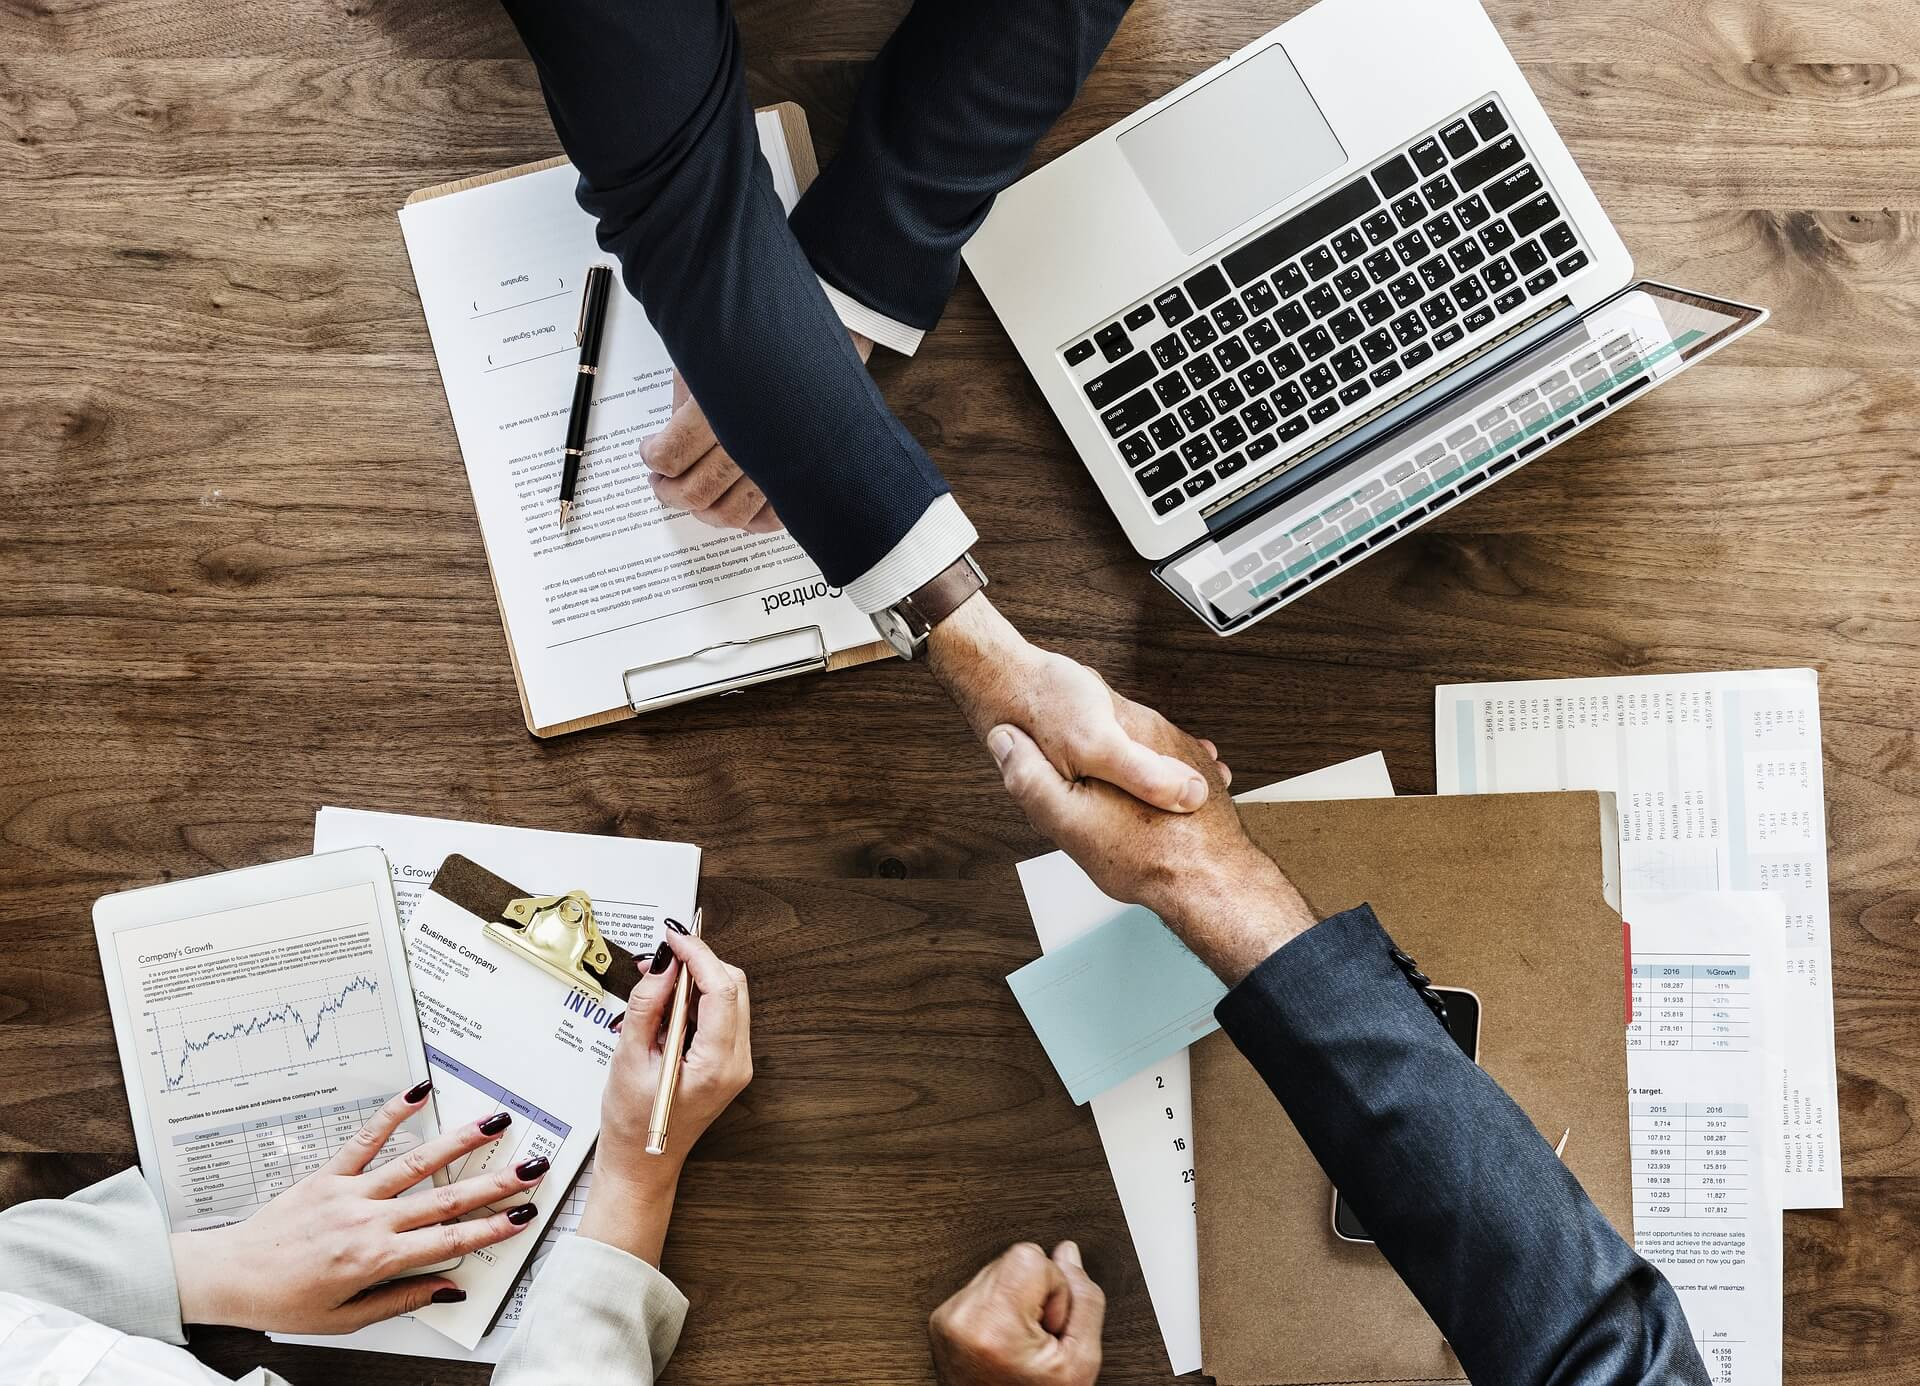 Moderniser sa gestion d'entreprise grâce au digital